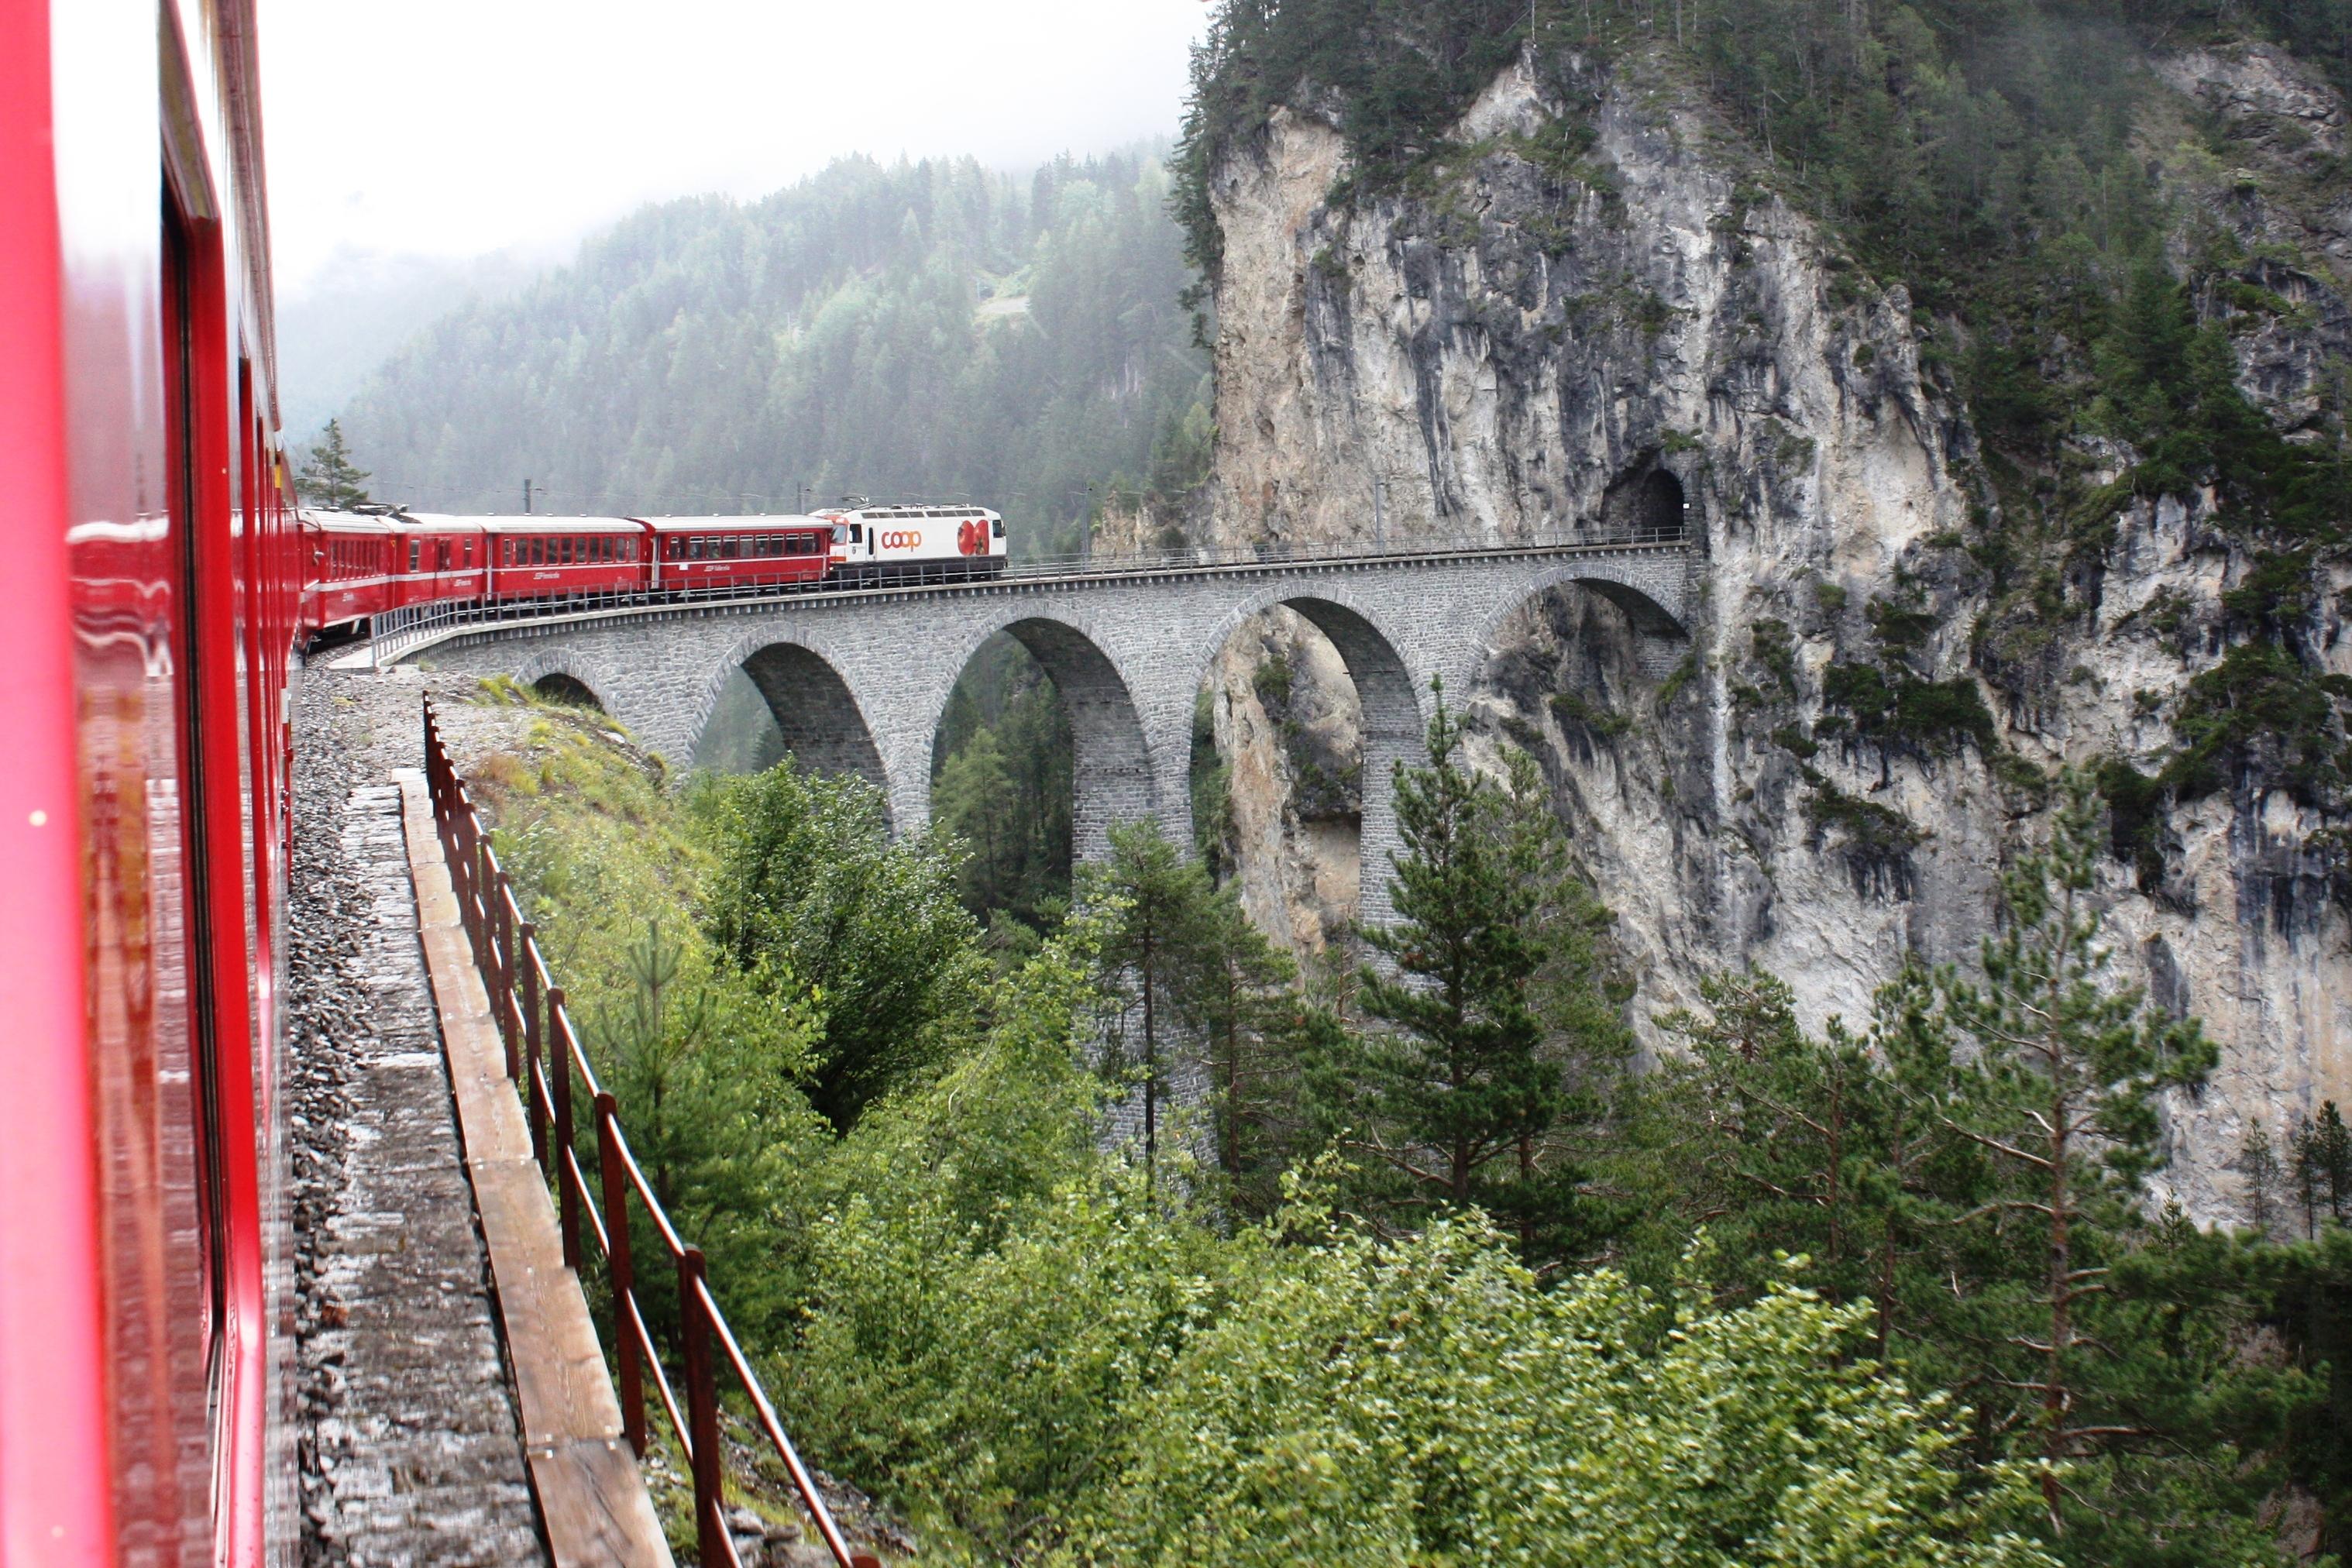 Regio train crossing Landwasser Viaduct